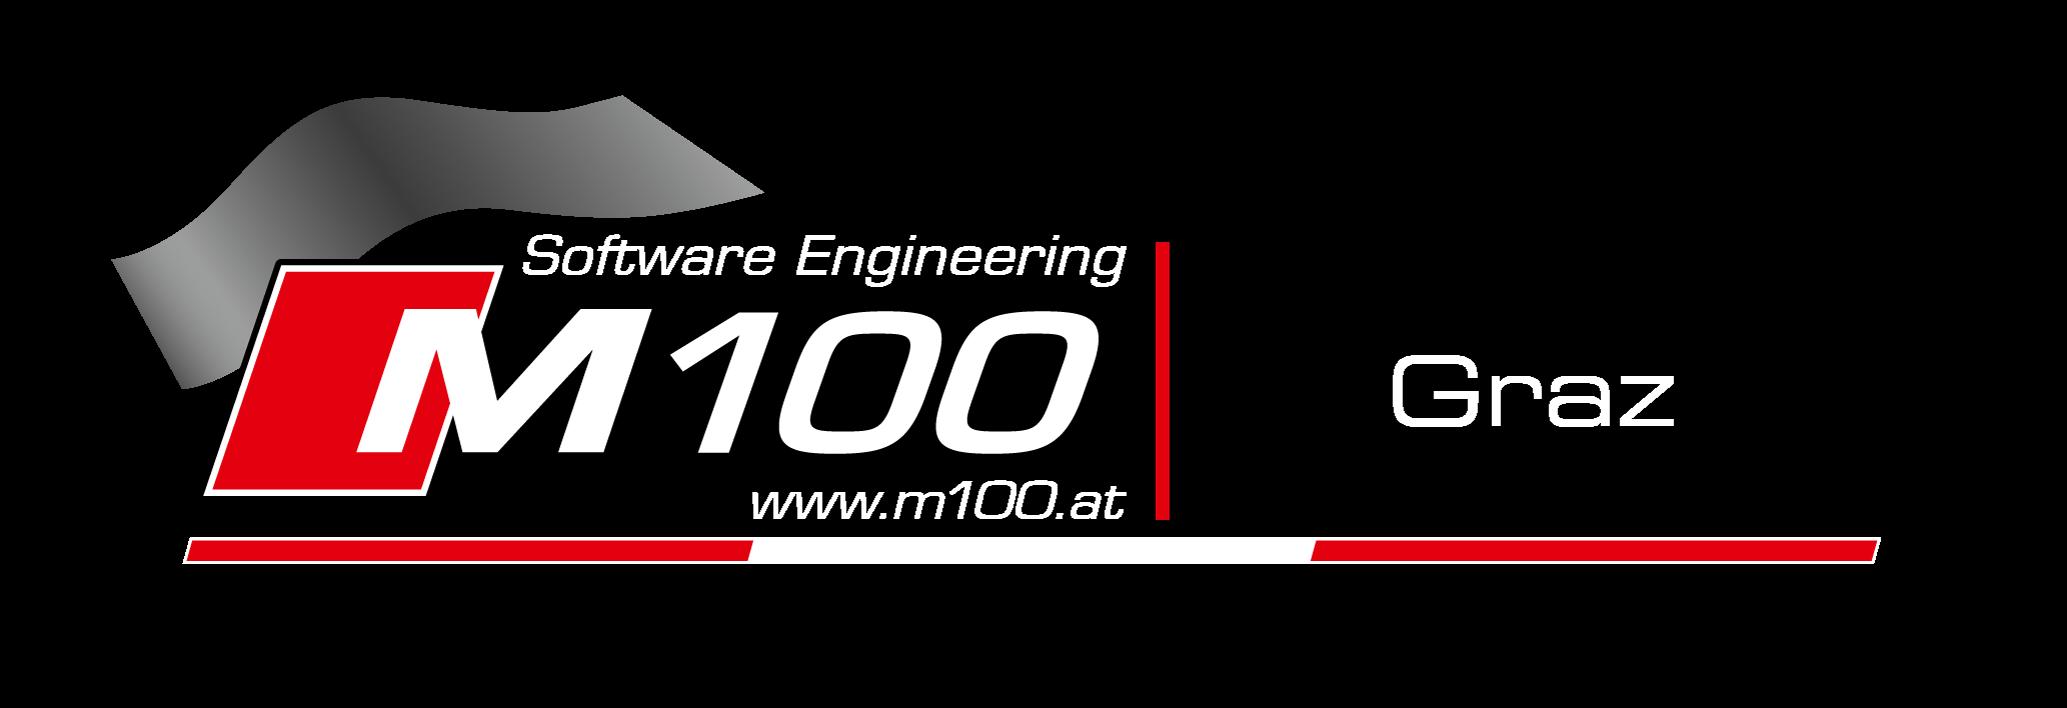 m100-graz